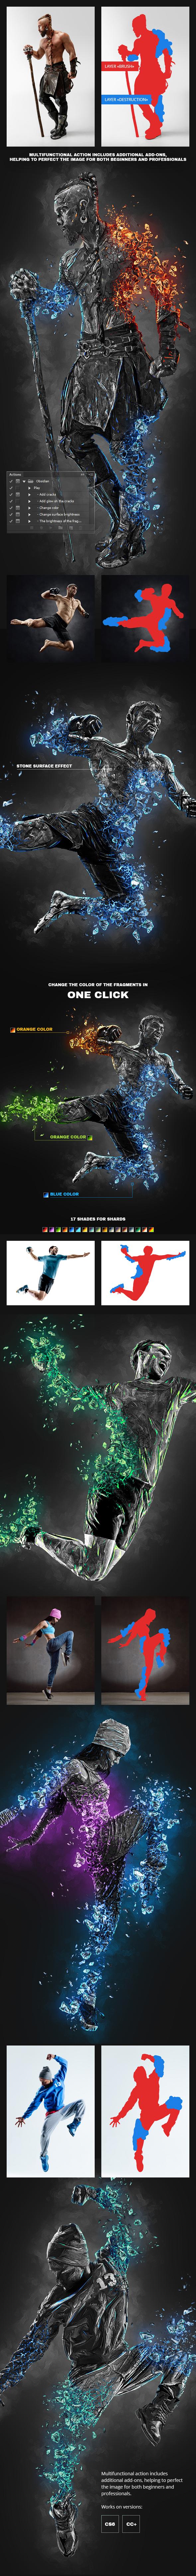 Obsidian Photoshop Action - 1